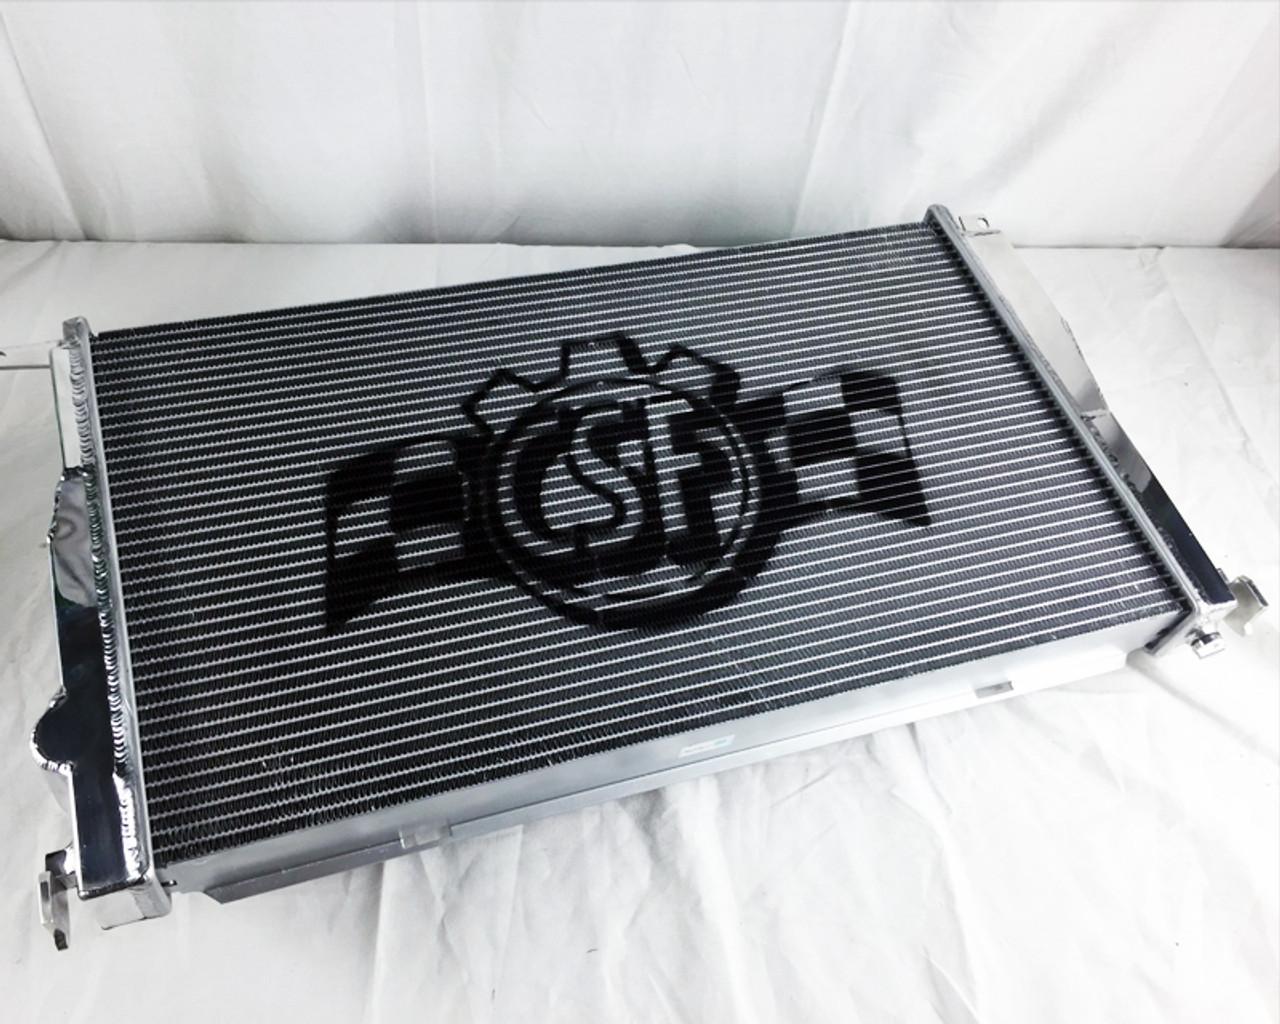 csf performance radiator upgrade 7045 bmw 135i 335i manual trans rh topgearsolutions com